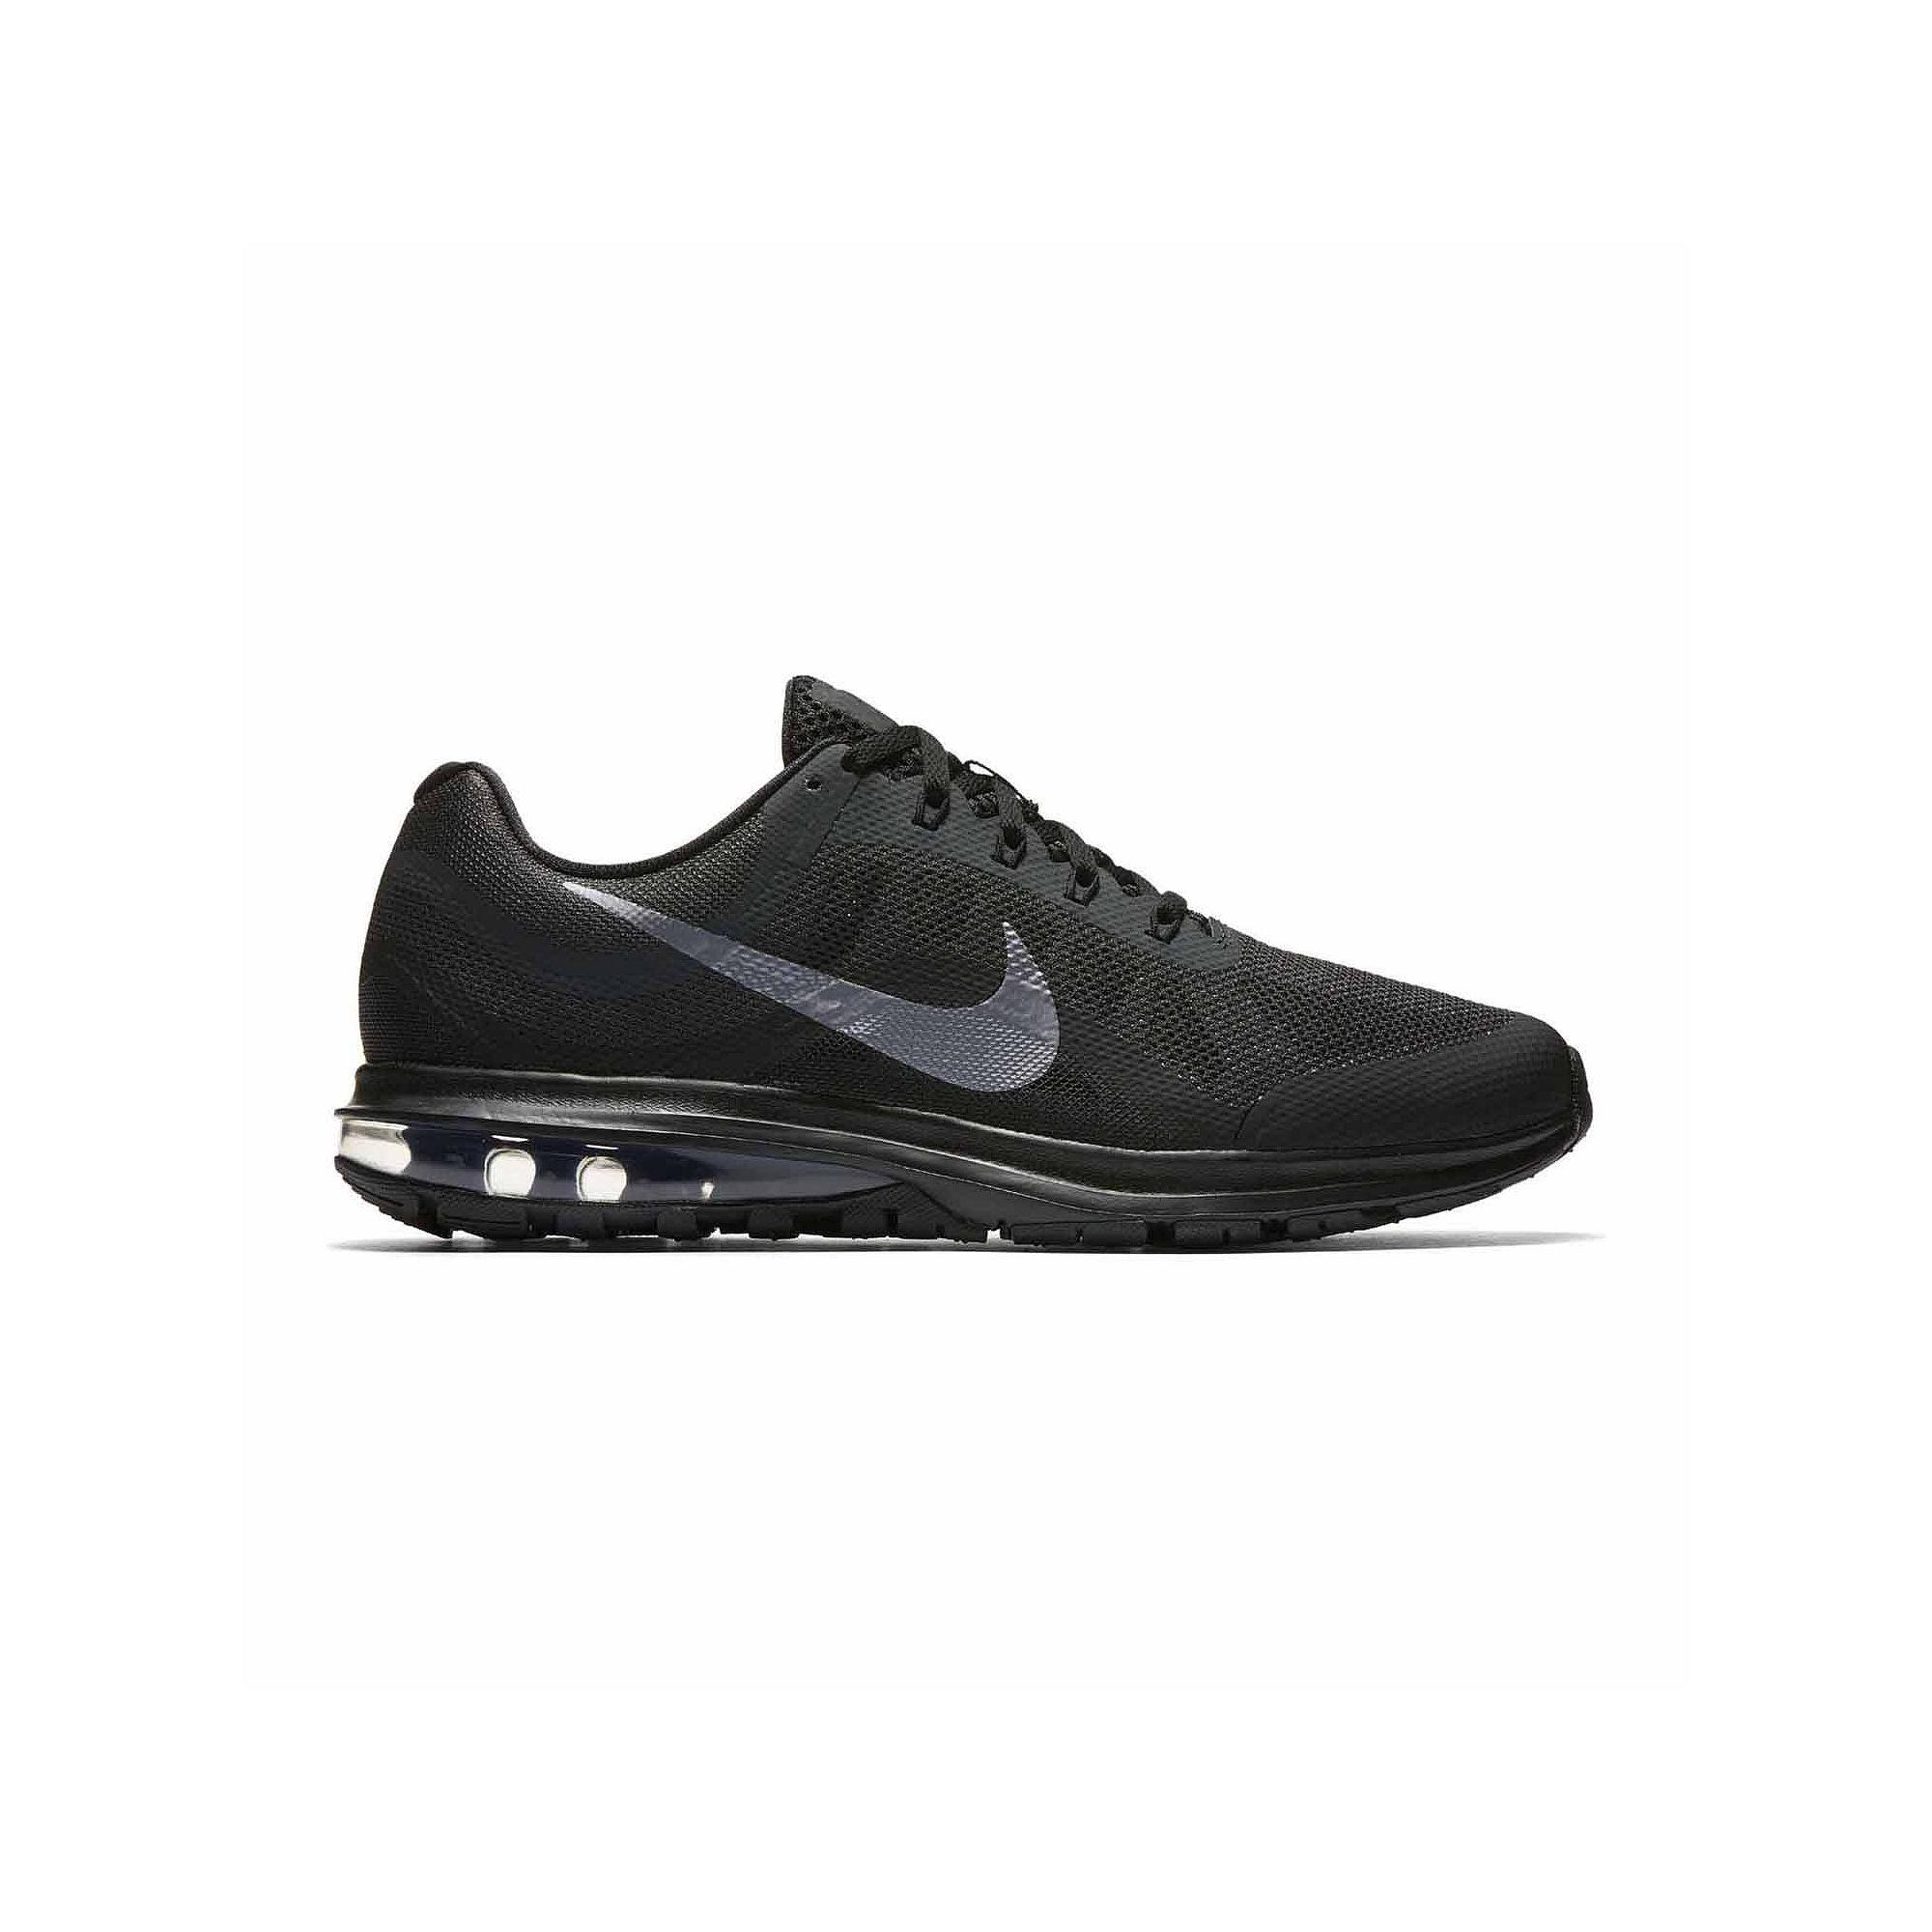 Amado Tom Audreath Baño  UPC 675911567159 - Nike Air Max Dynasty 2 Mens Running Shoes ...